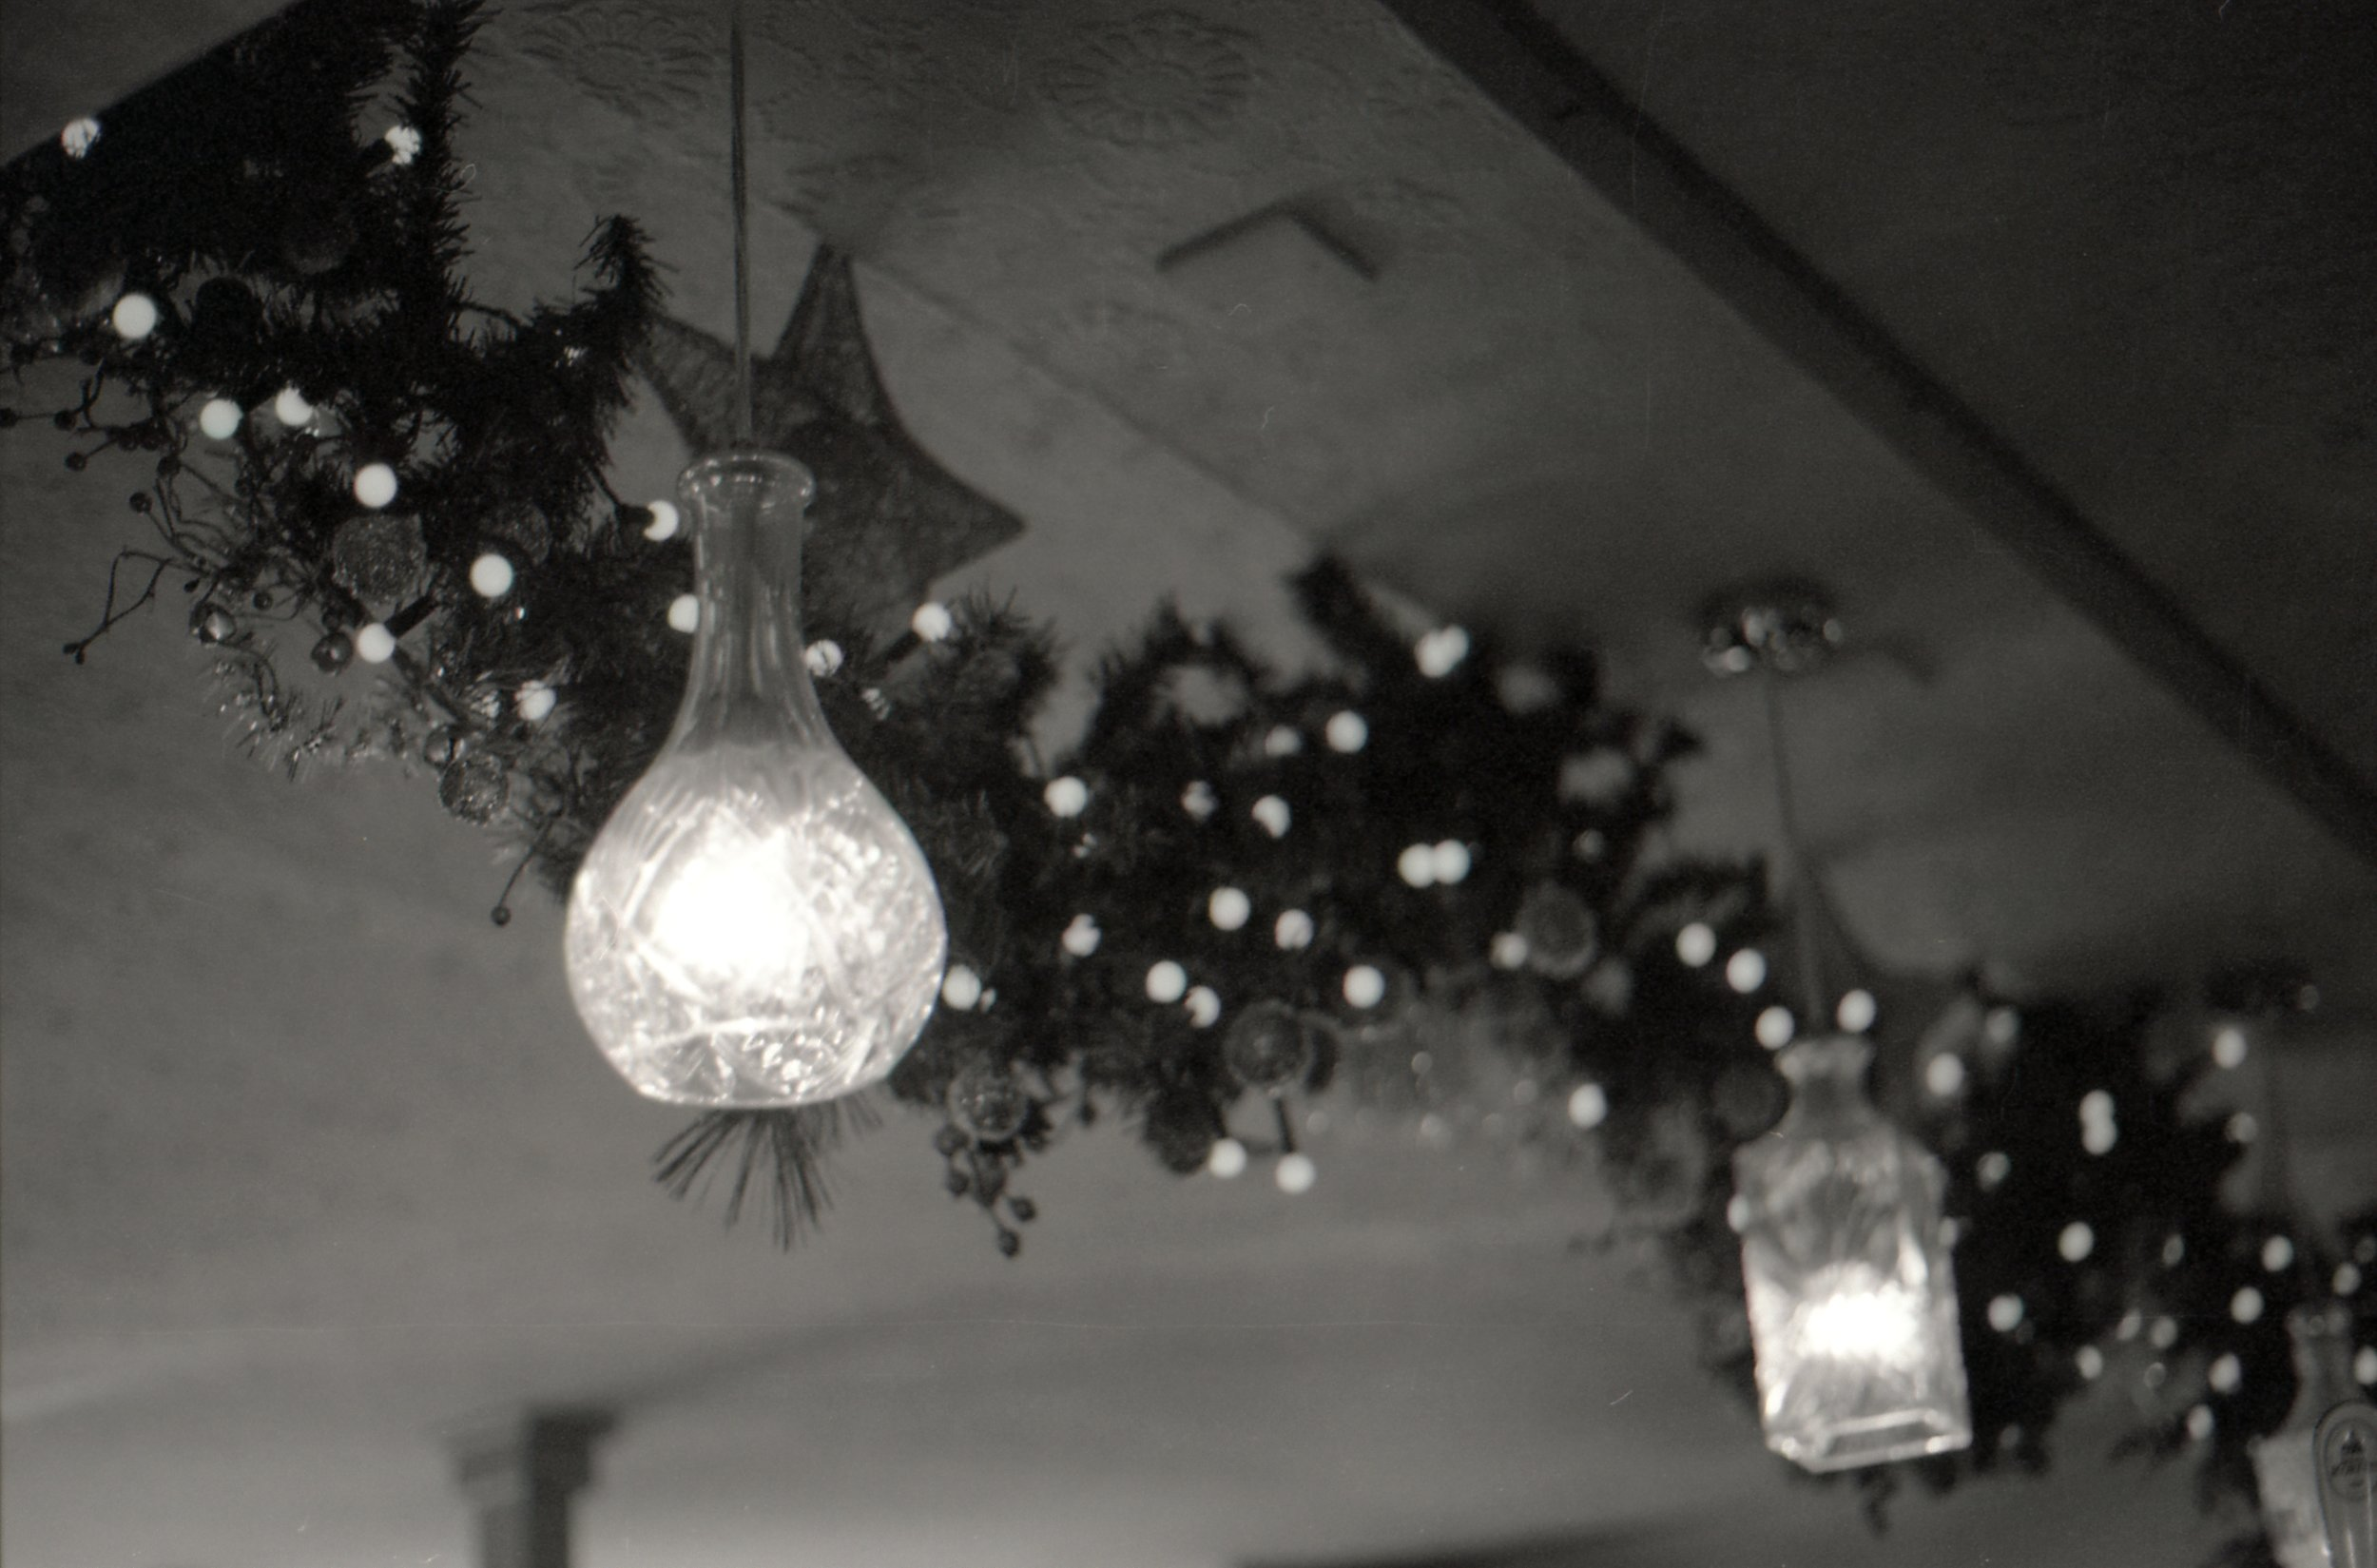 339/366/2016 - Pretty lights at our local pub